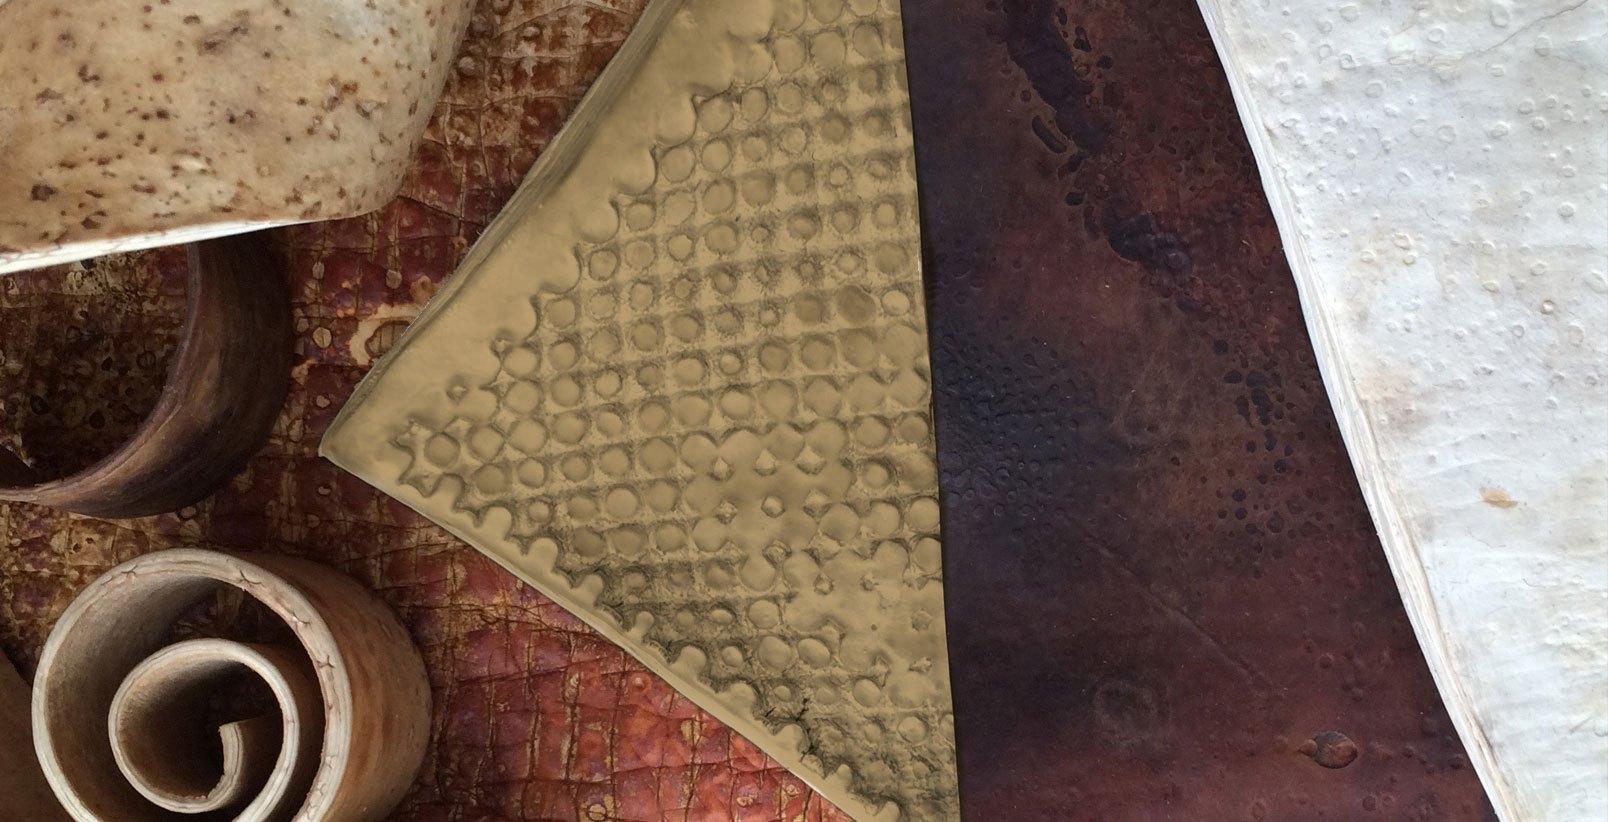 Mycoworks mycellium-based (fungus) leather. - Source:mycoworks.com